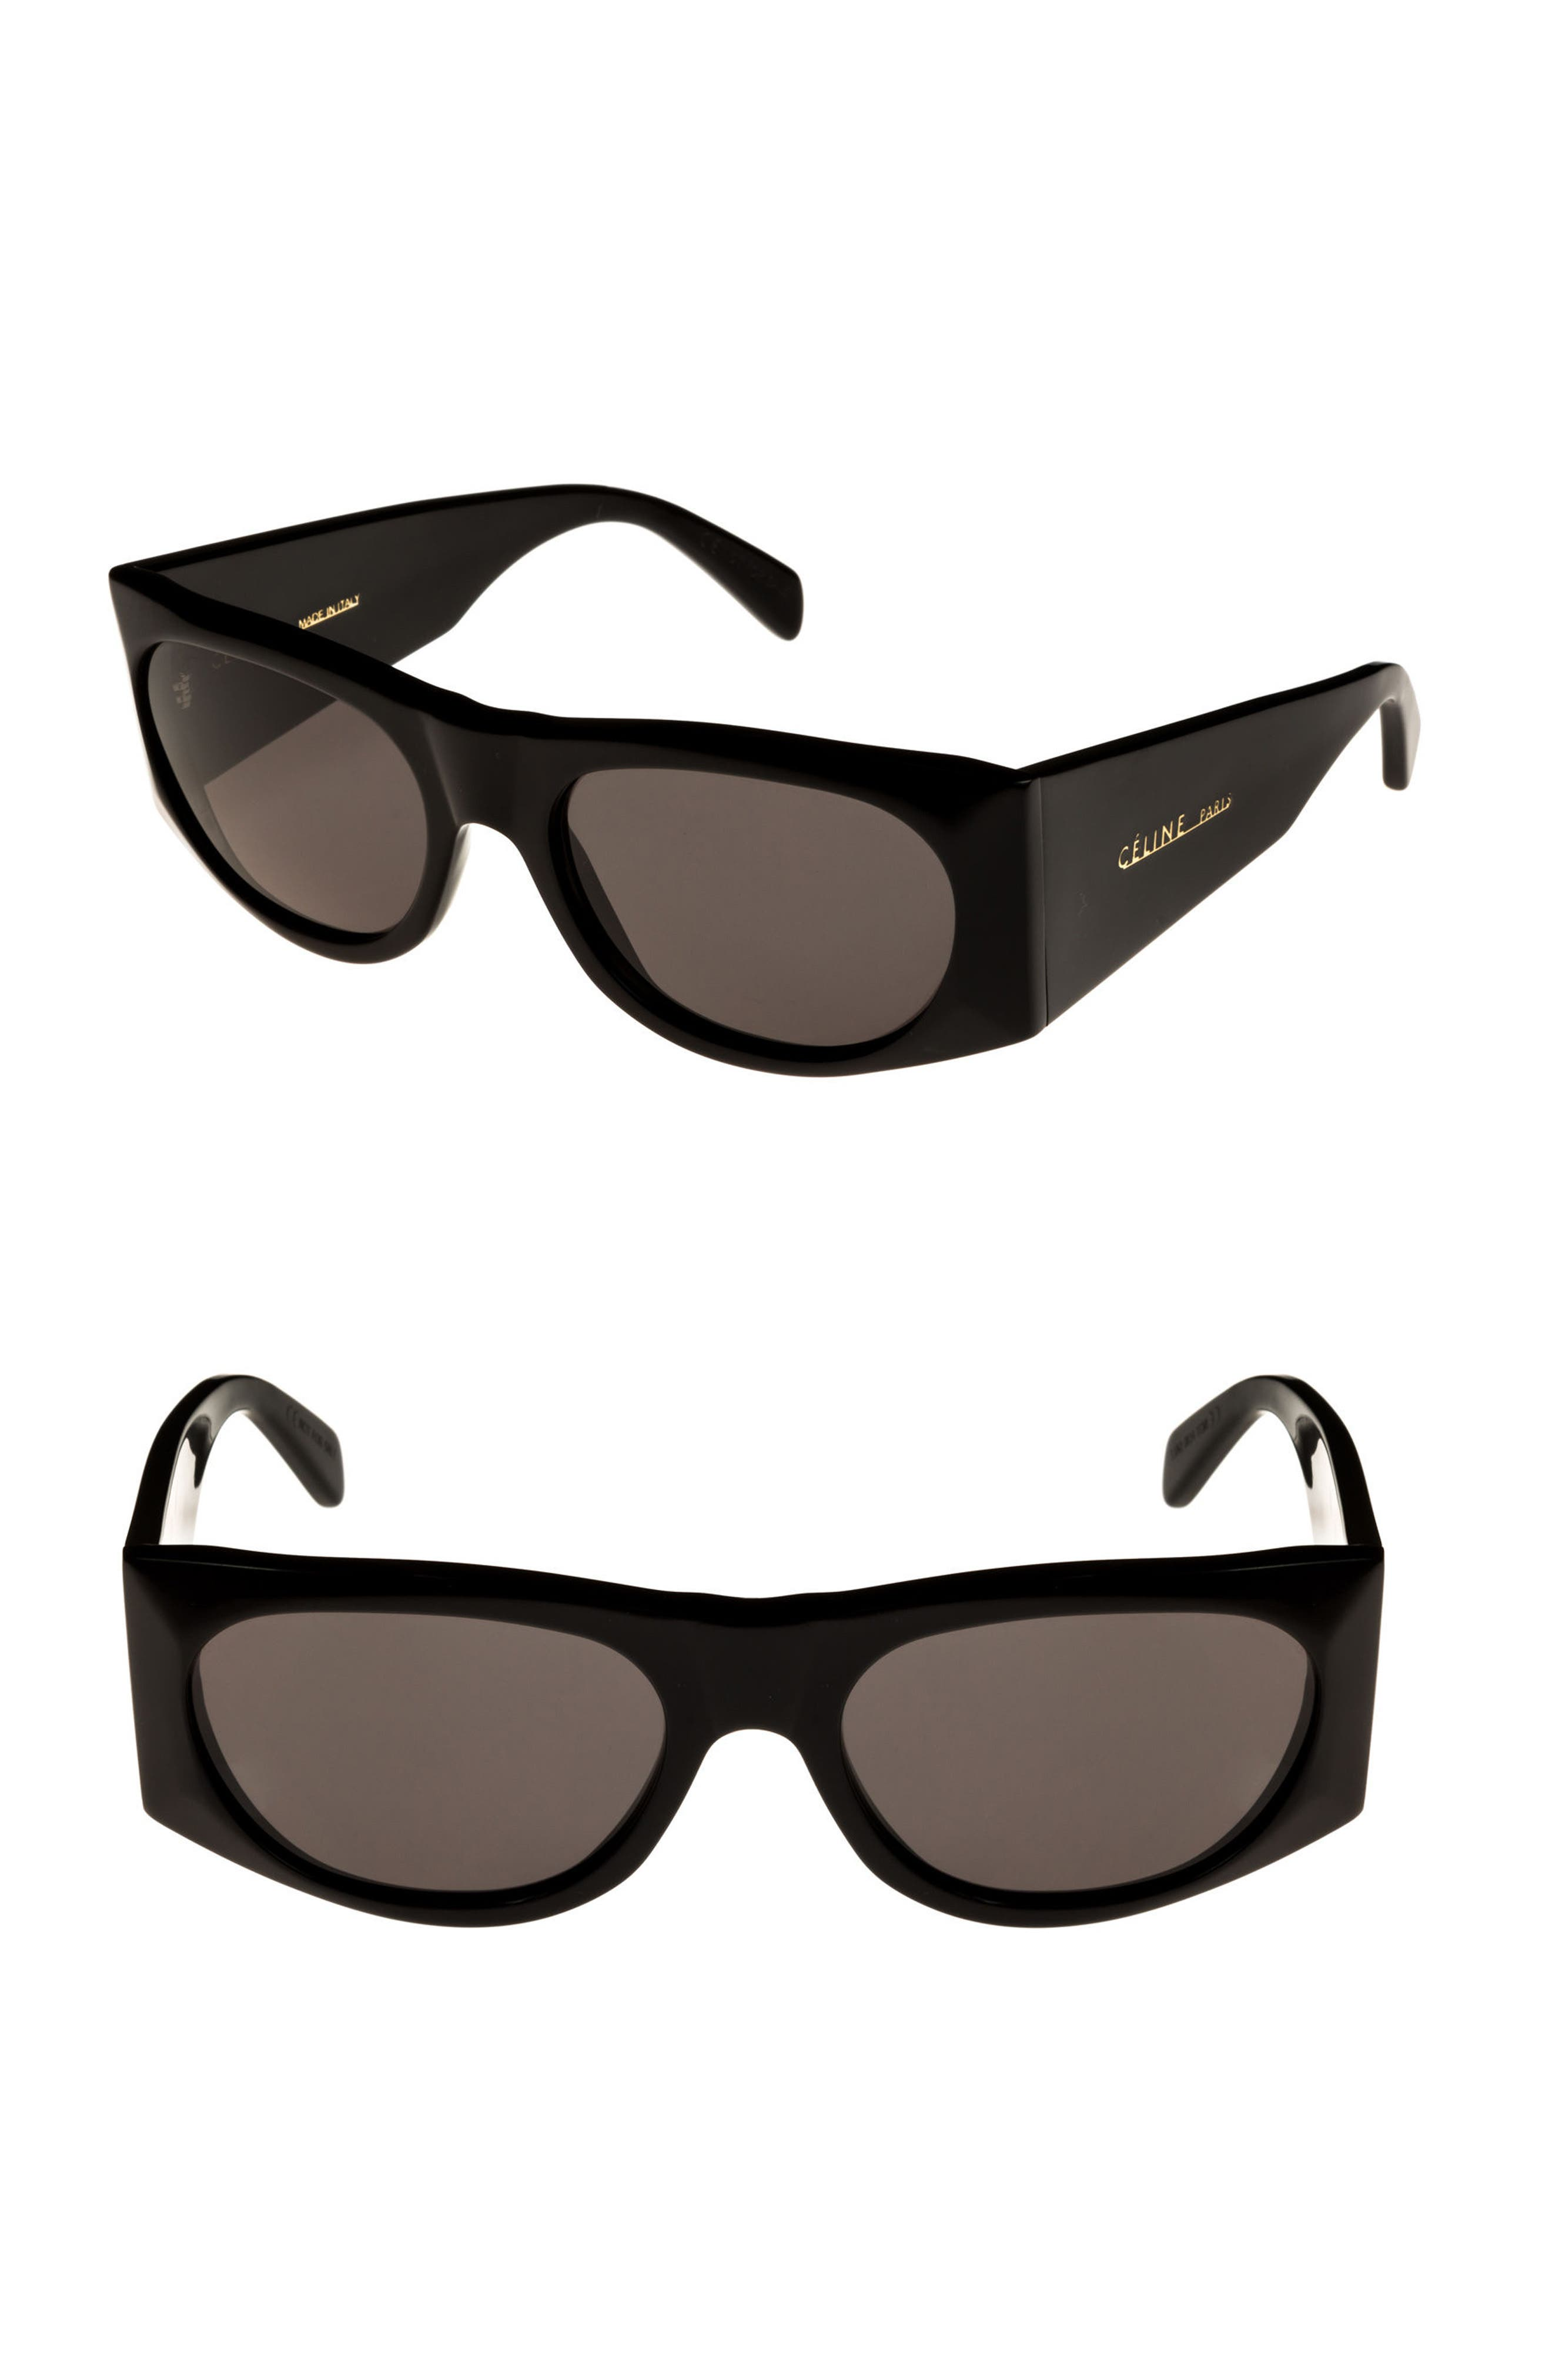 59mm Sunglasses,                             Main thumbnail 1, color,                             BLACK/ SMOKE